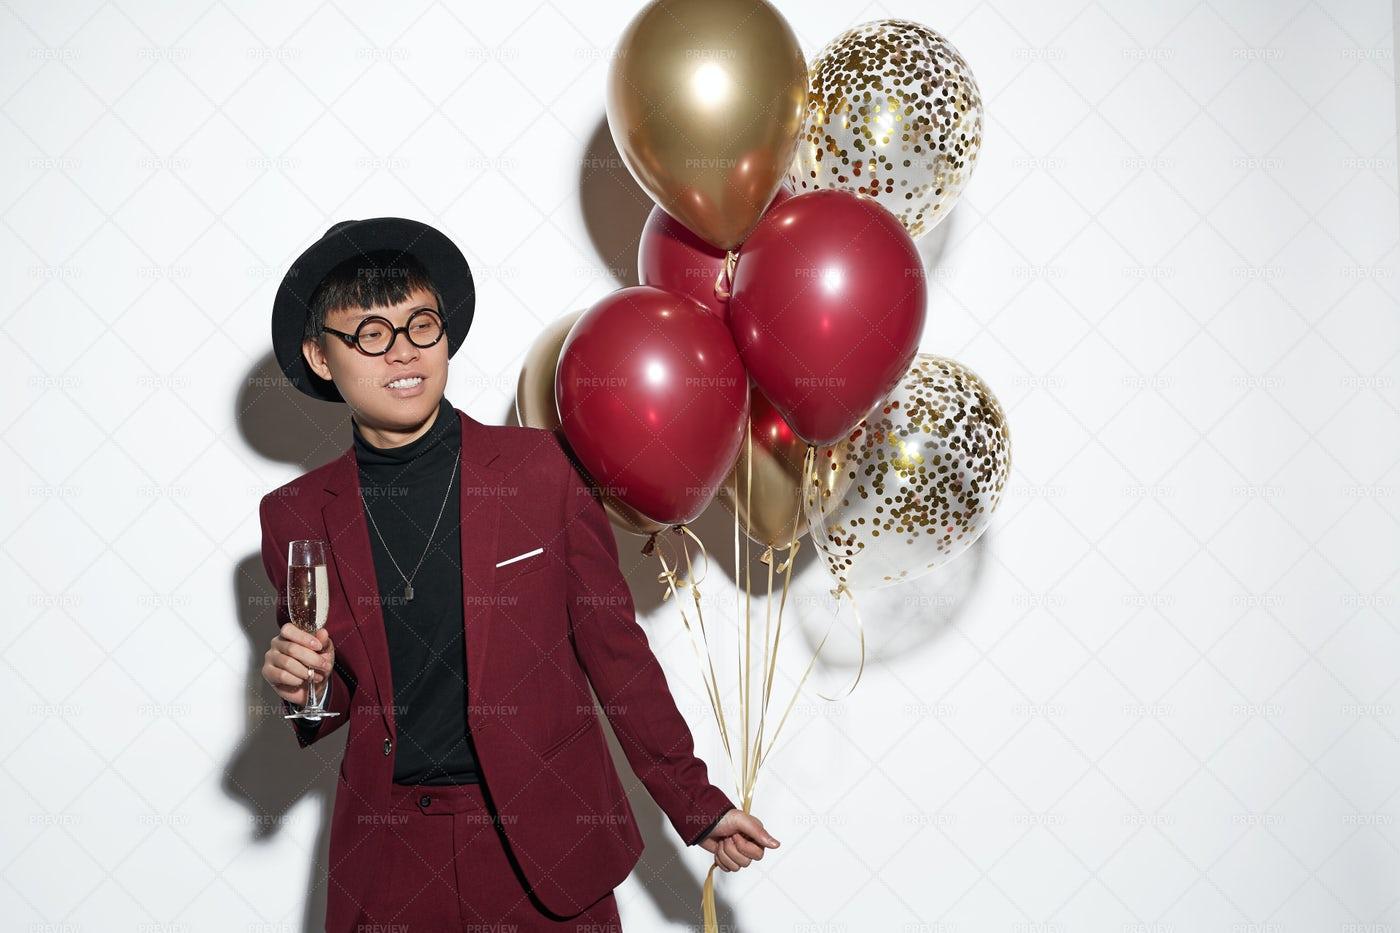 Asian Man Holding Balloons At Party: Stock Photos